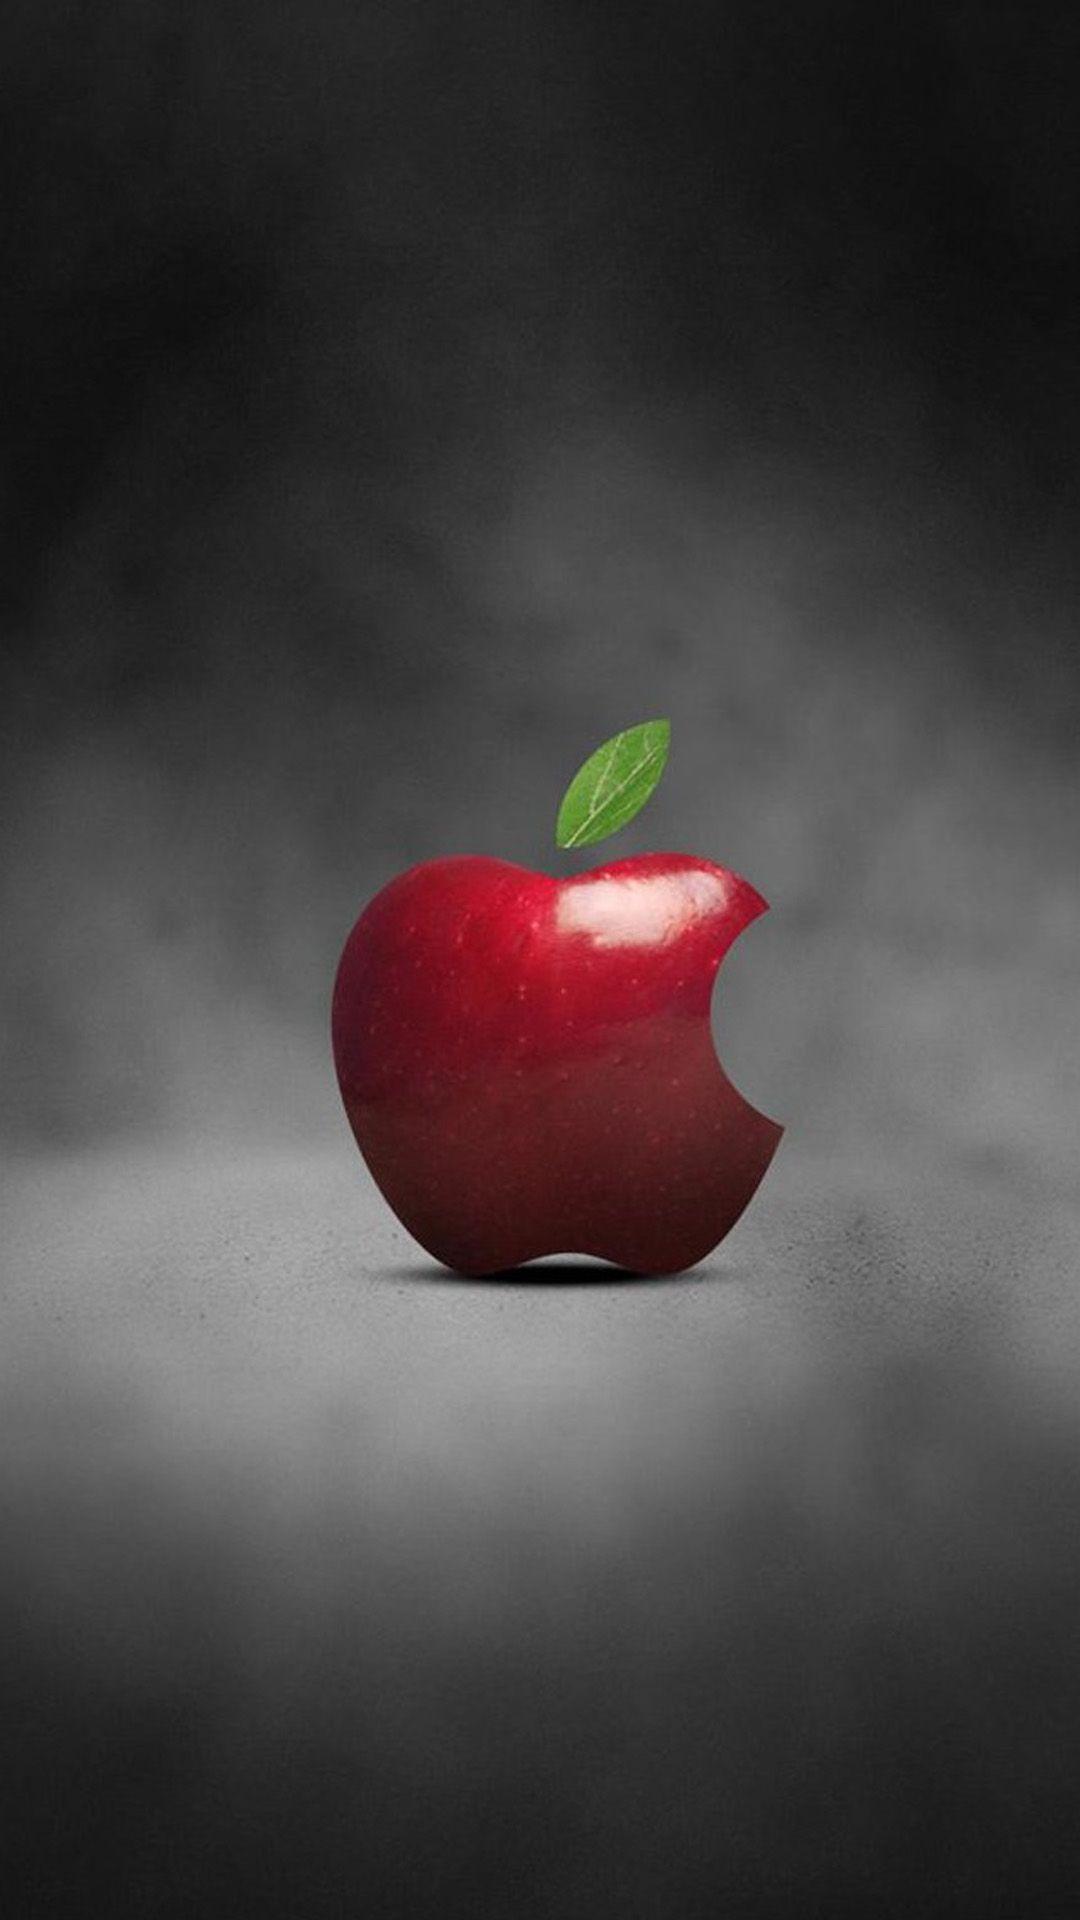 Unduh 600 Wallpaper Hp Apple HD Terbaik